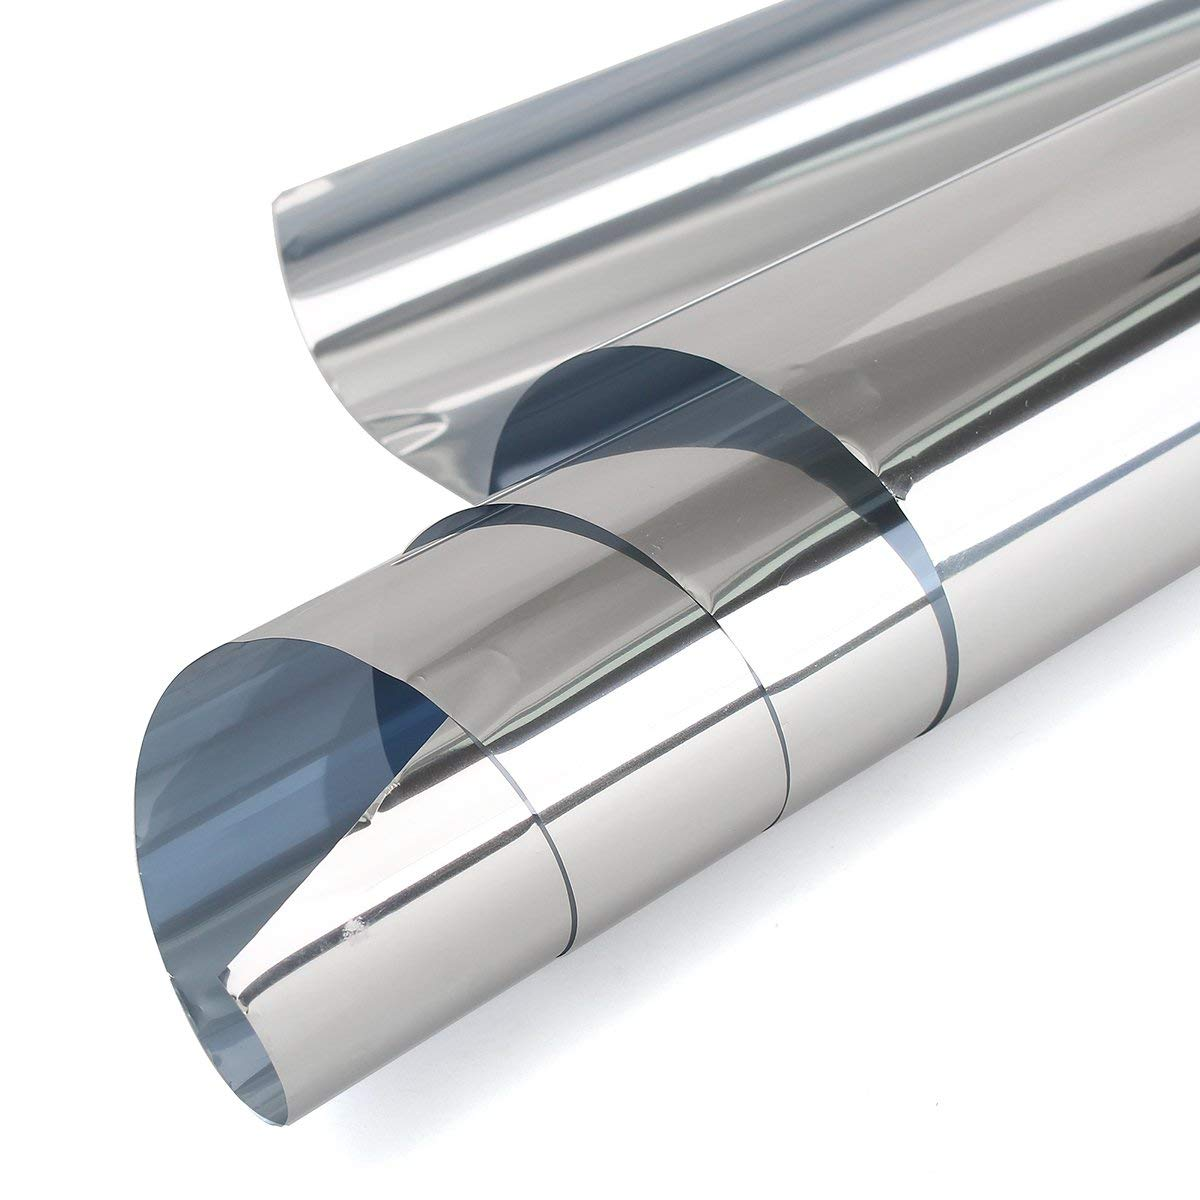 Cheap Mirror Window Film Find Deals On Line At Kaca Oneway Premium Get Quotations Safetyon Silver Tint 76x100cm 15 Solar Reflective